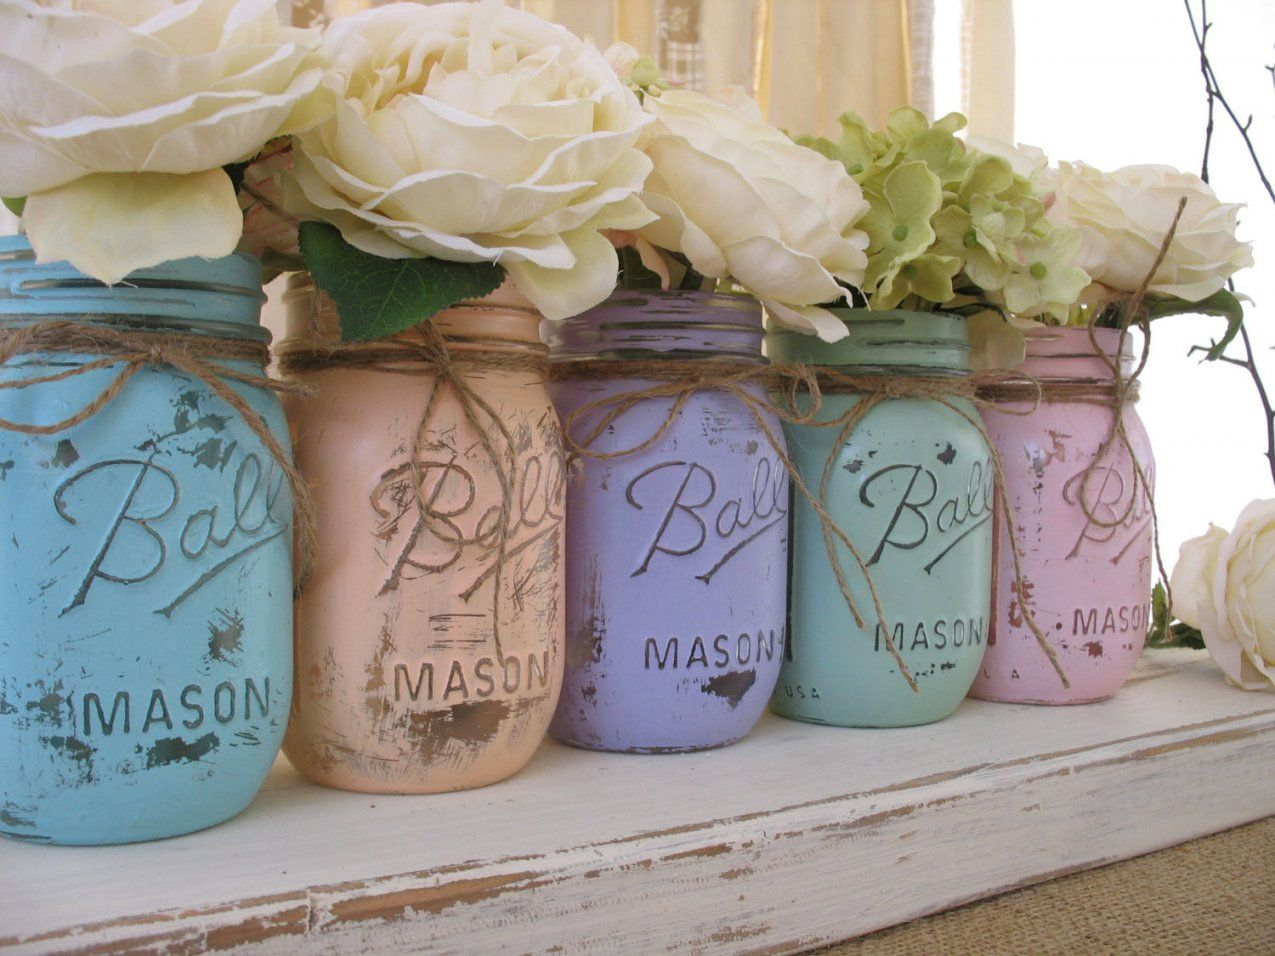 Ways To Turn Mason Jars Into Vases von Mason Jar Flower Vases Bild